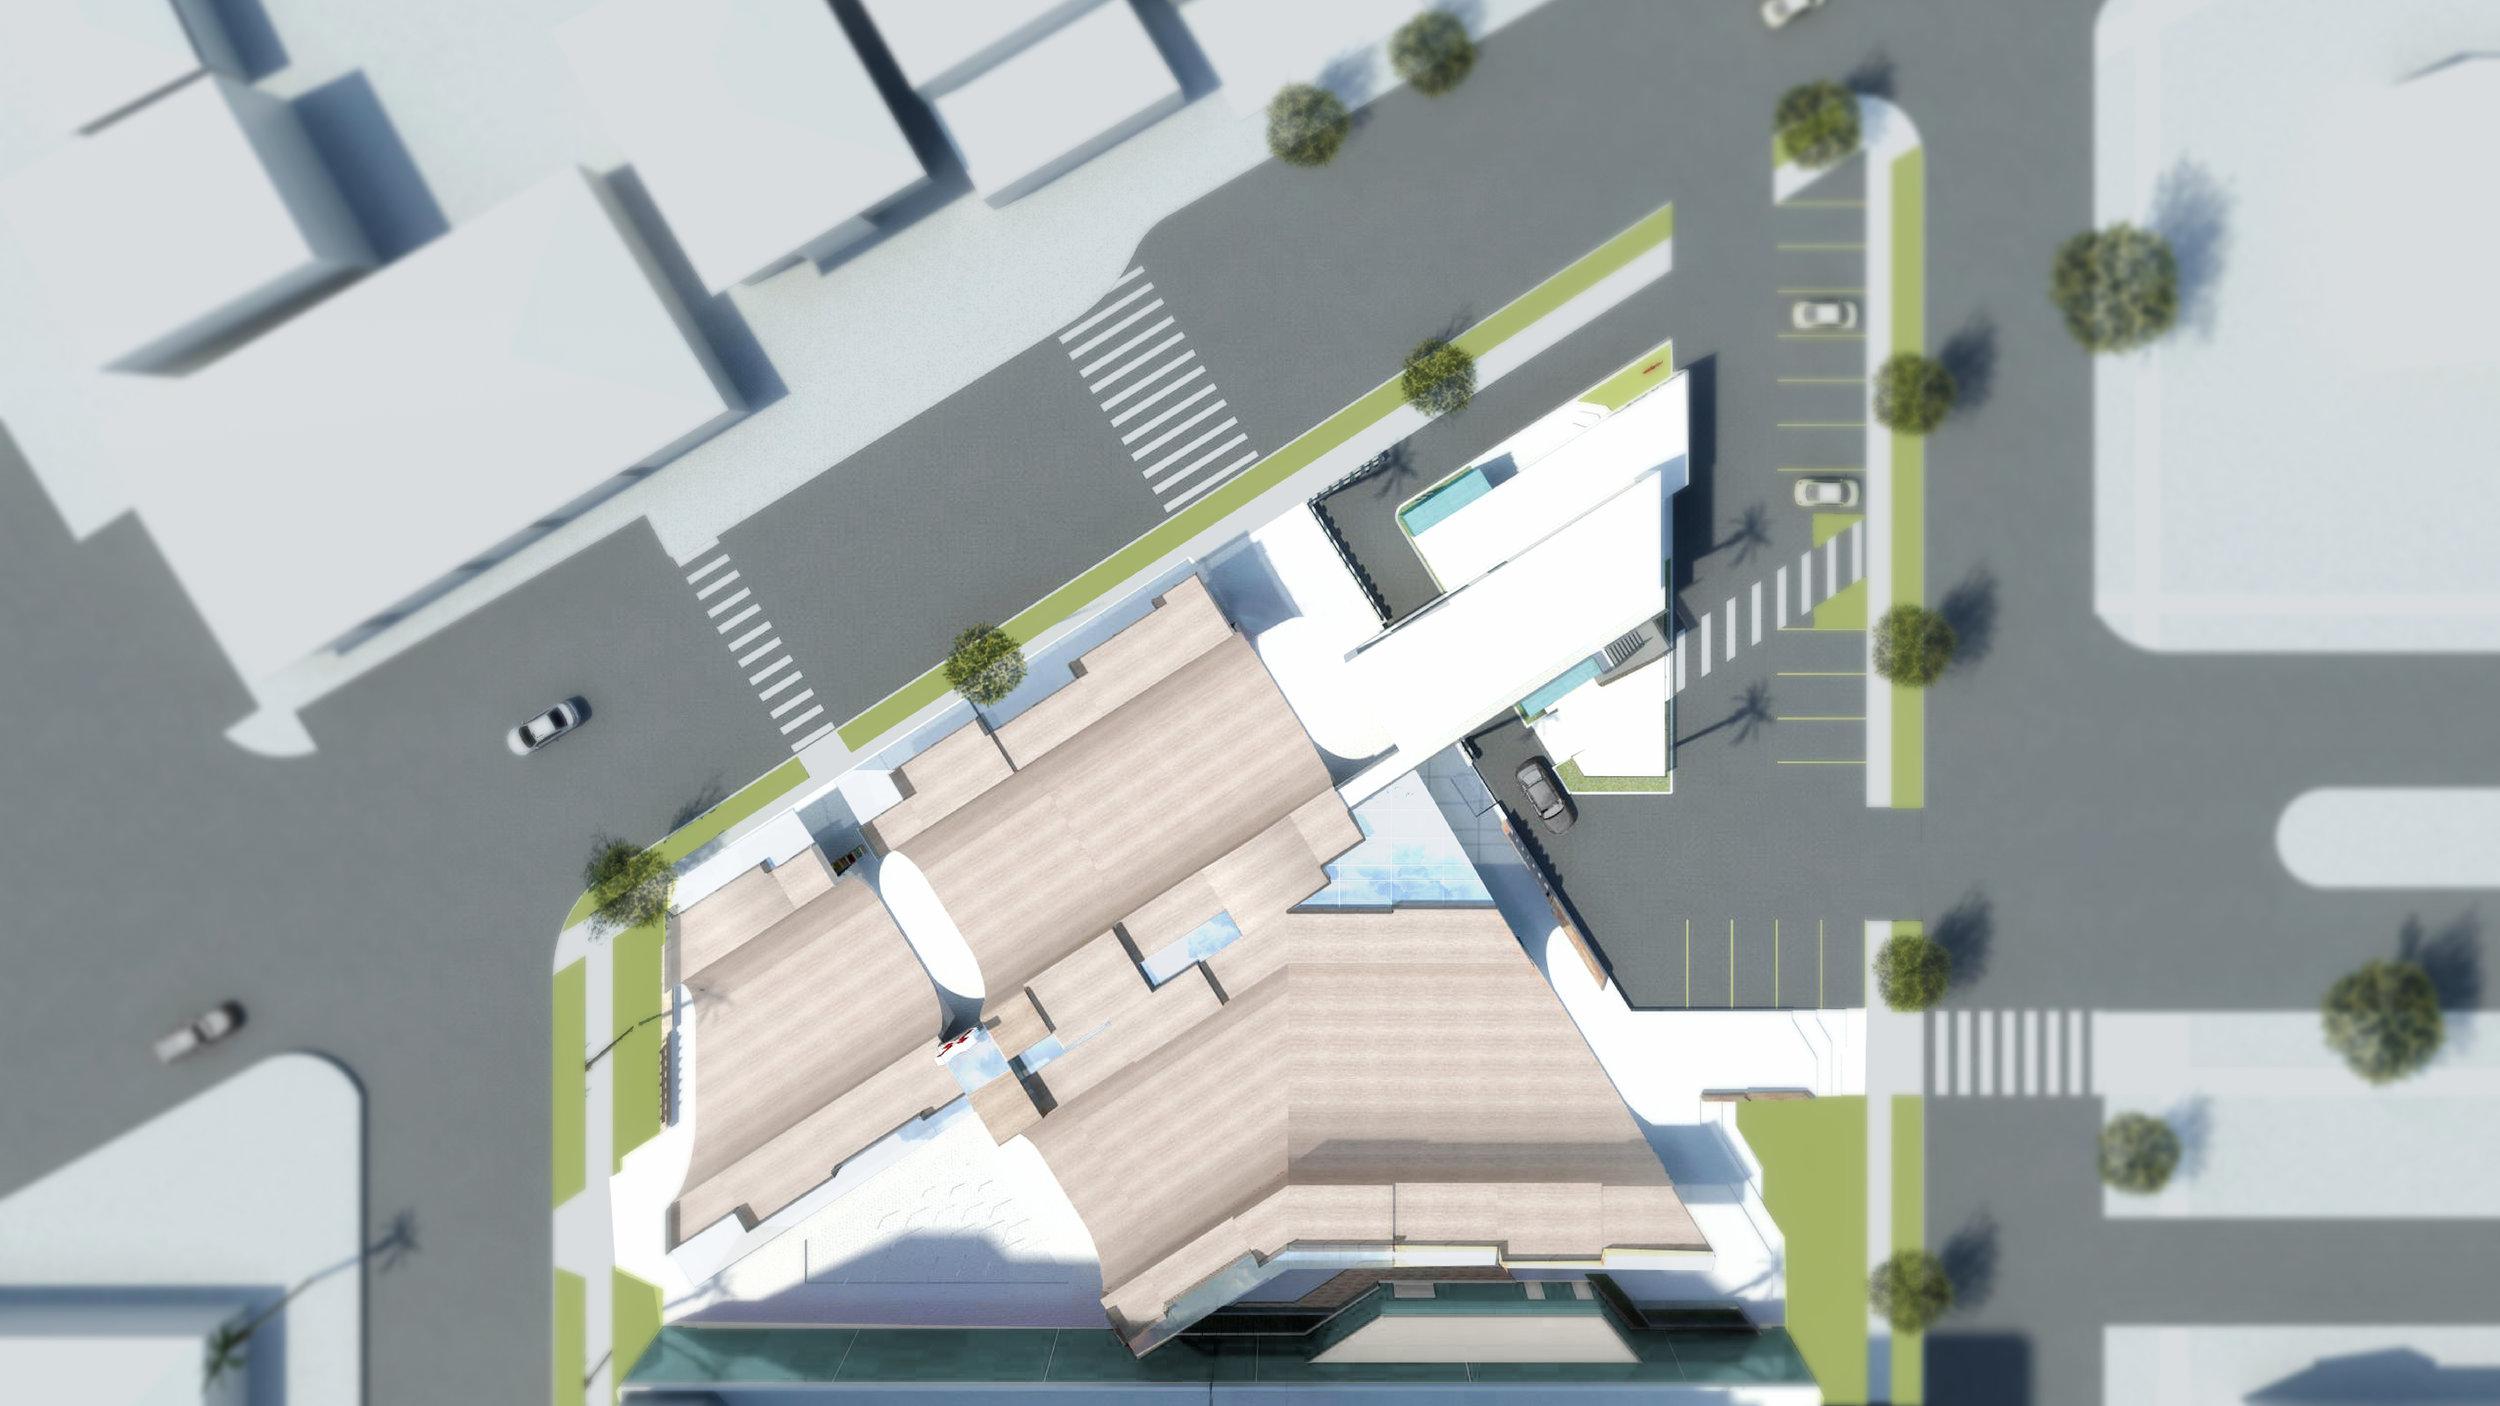 (4/7) Urban Intervention - Graduate Studio